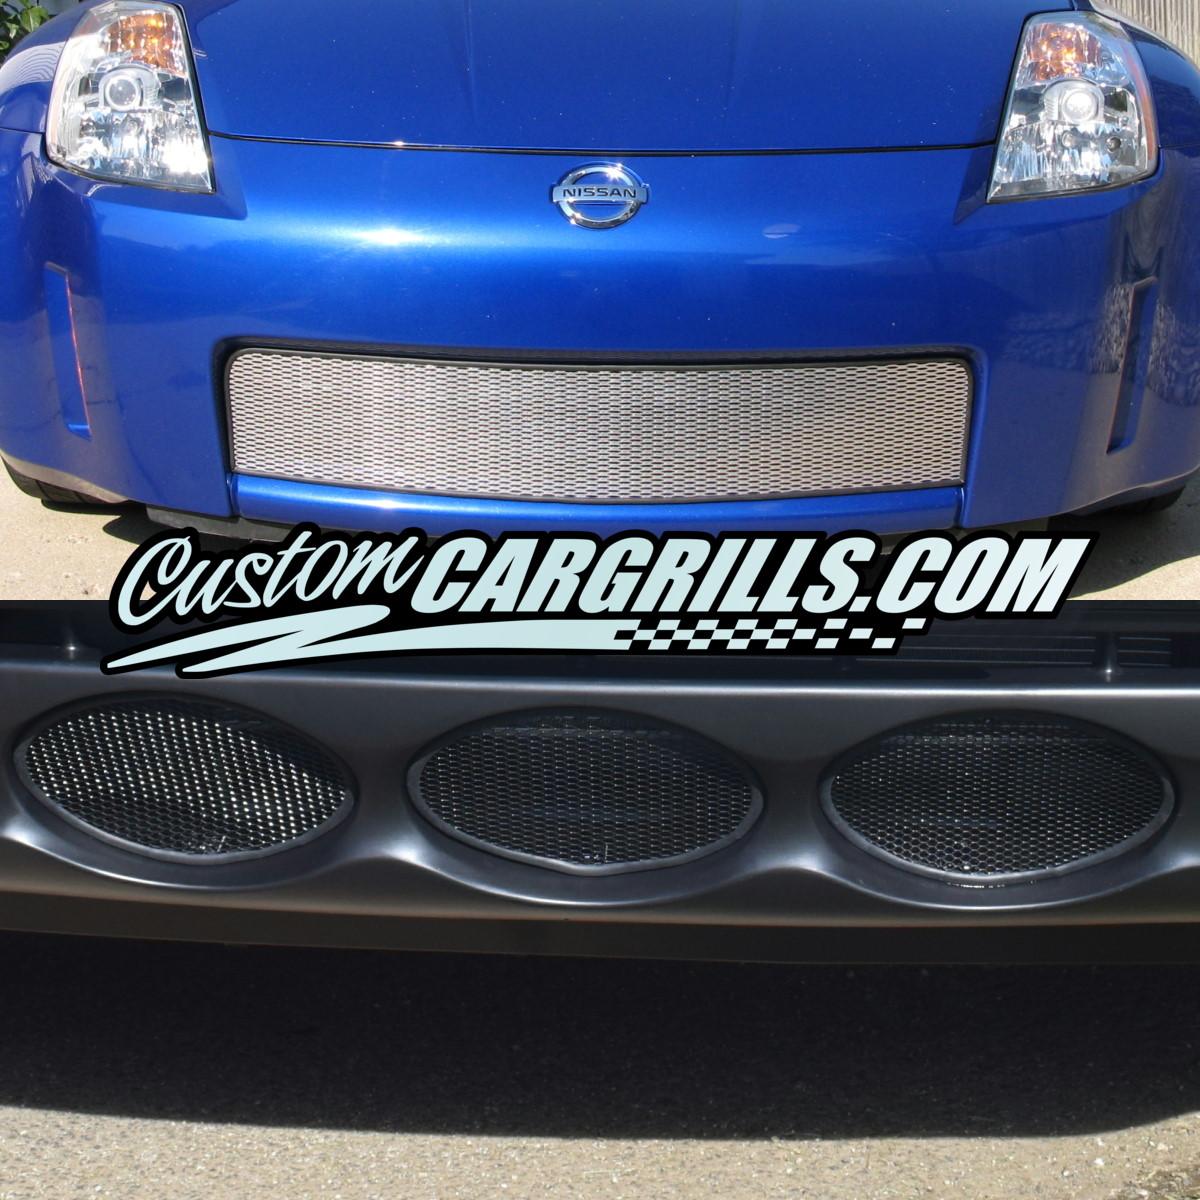 www.customcargrills.com